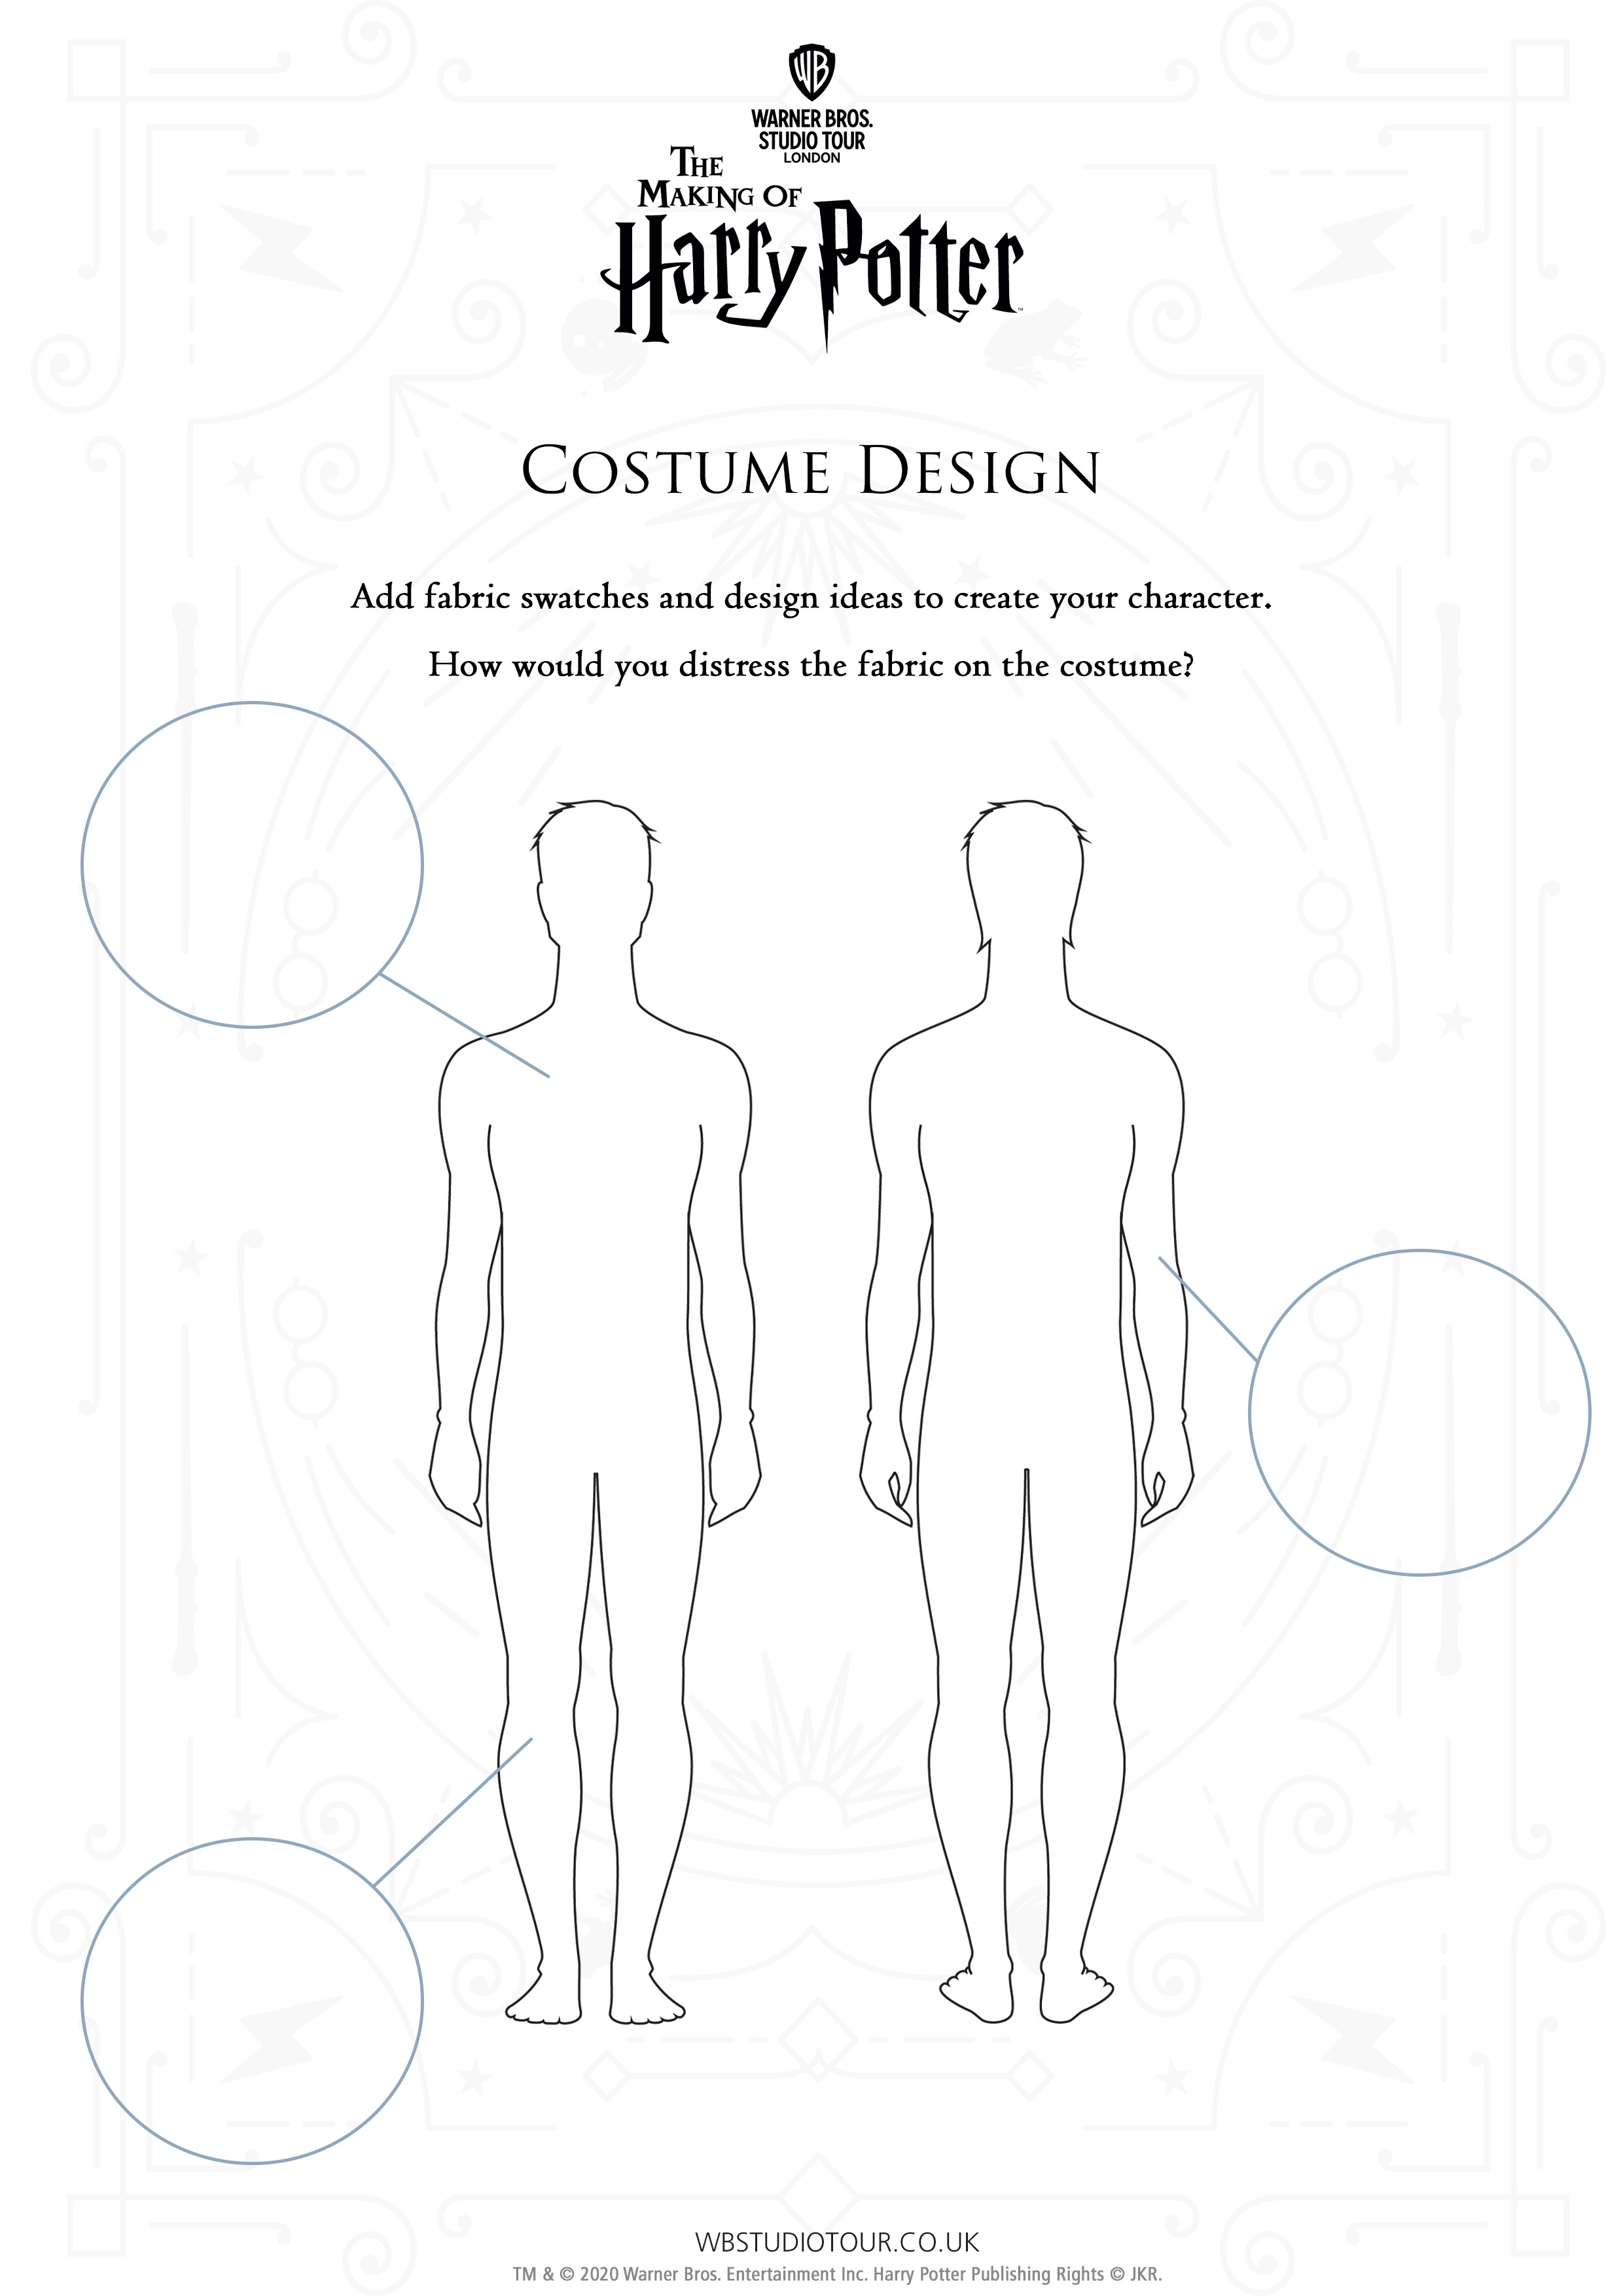 Costume Distressing Activity Sheet thumbnail